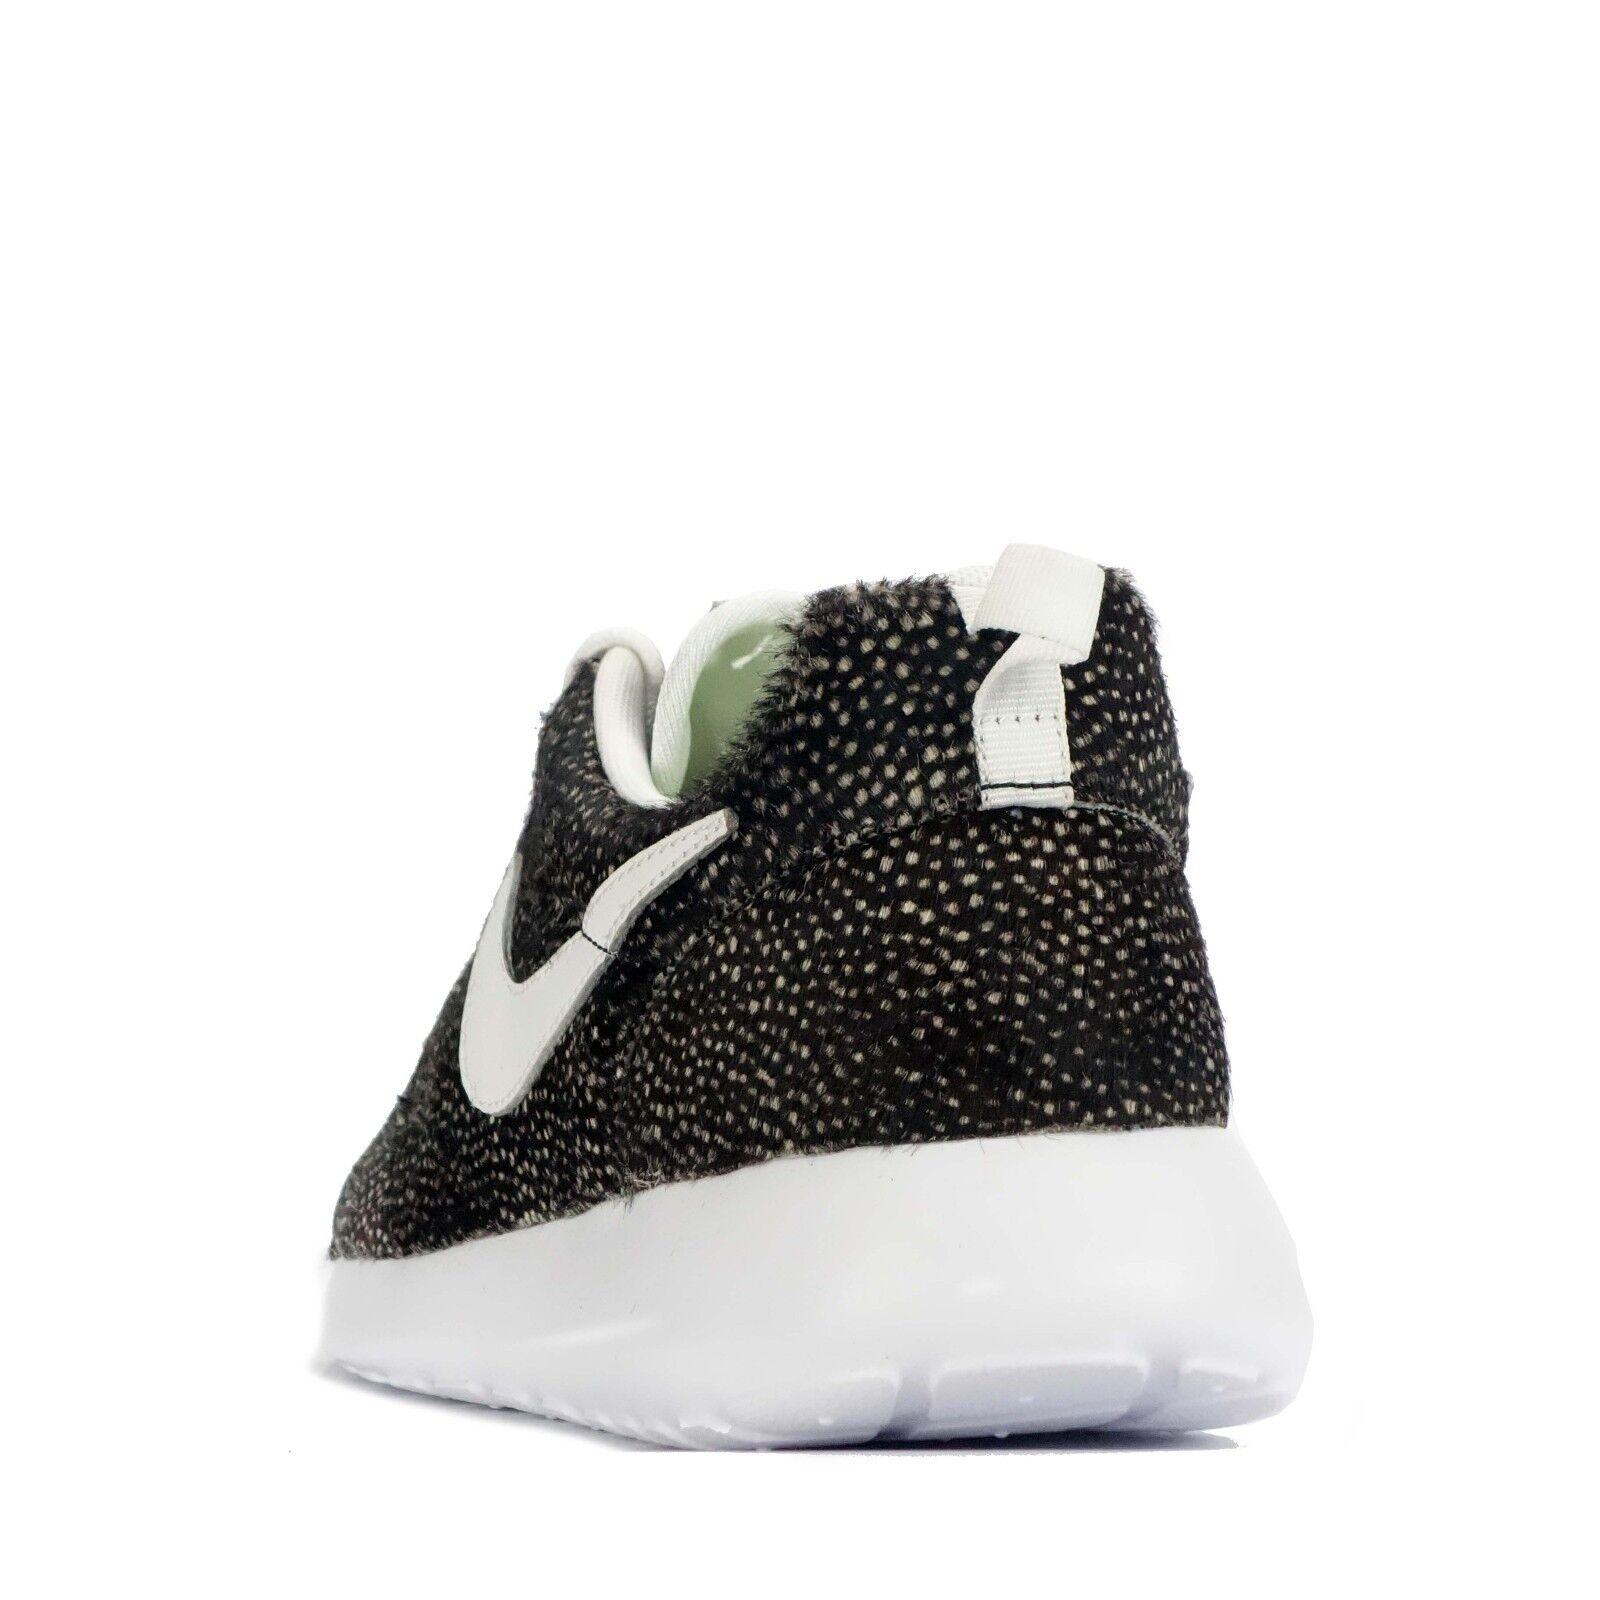 wholesale dealer 9994b 56dde ... inexpensive nike id rosherun poka dots donna scarpe casual da  ginnastica casual scarpe in marrone bianca